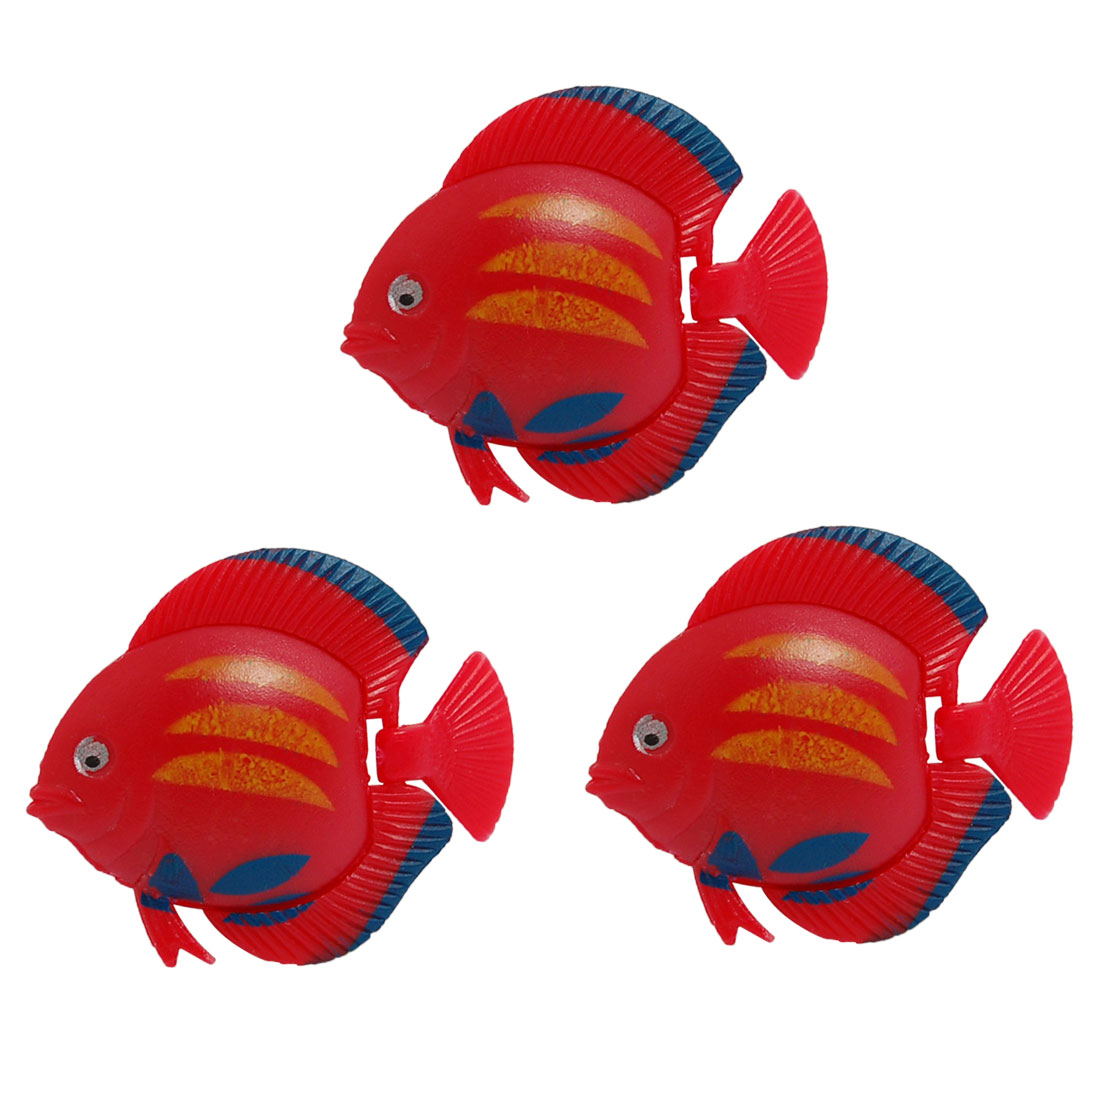 3 Pcs Red Plastic Floating Tropical Fish for Aquarium